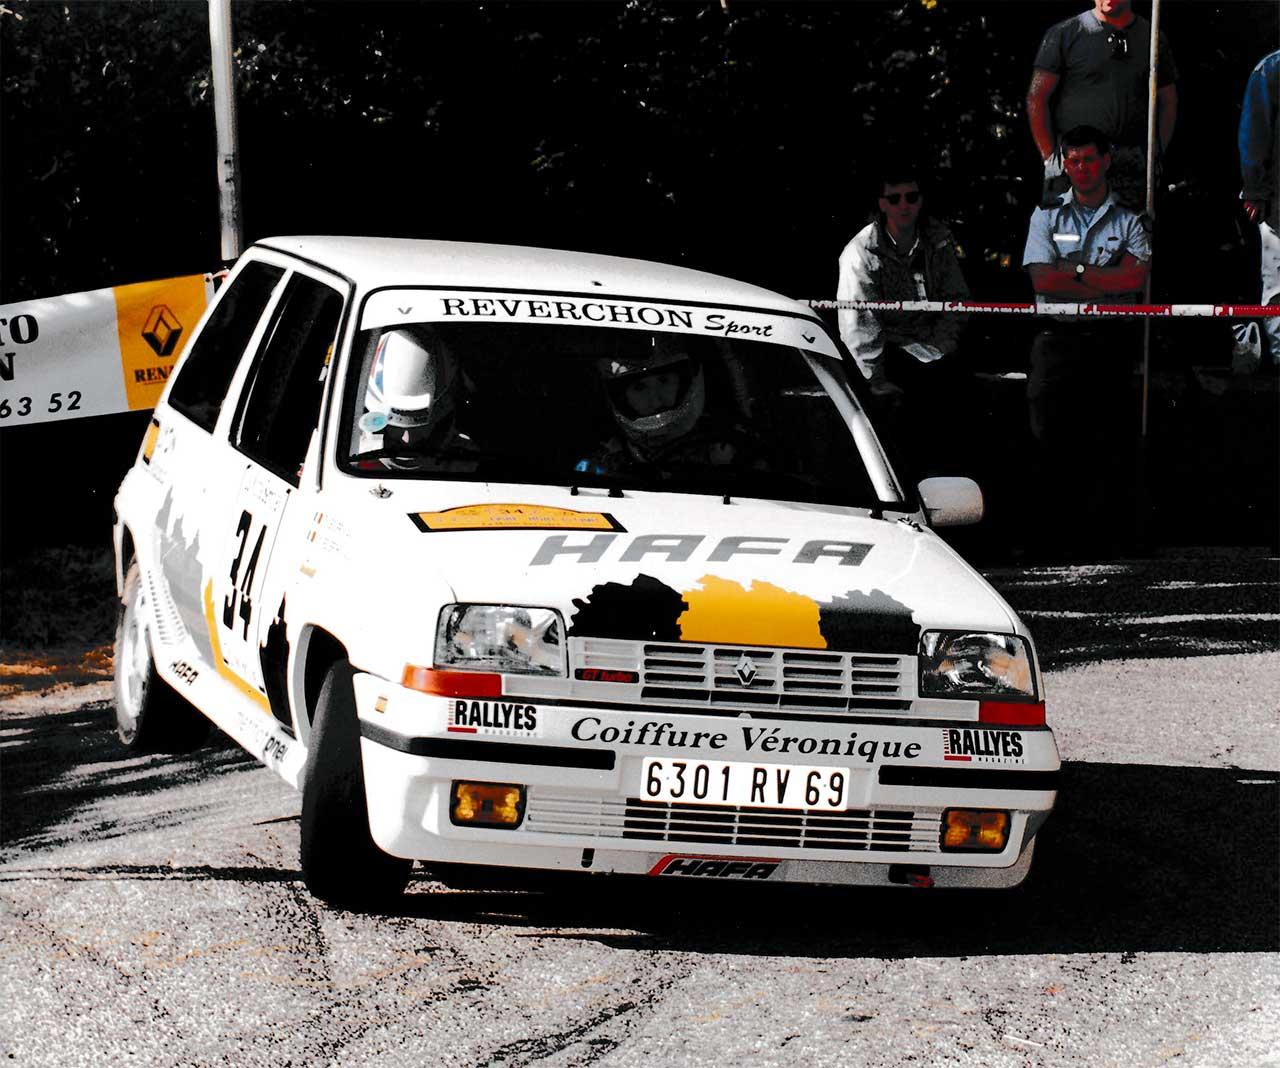 Super 5 GT Turbo, Christian REVERCHON